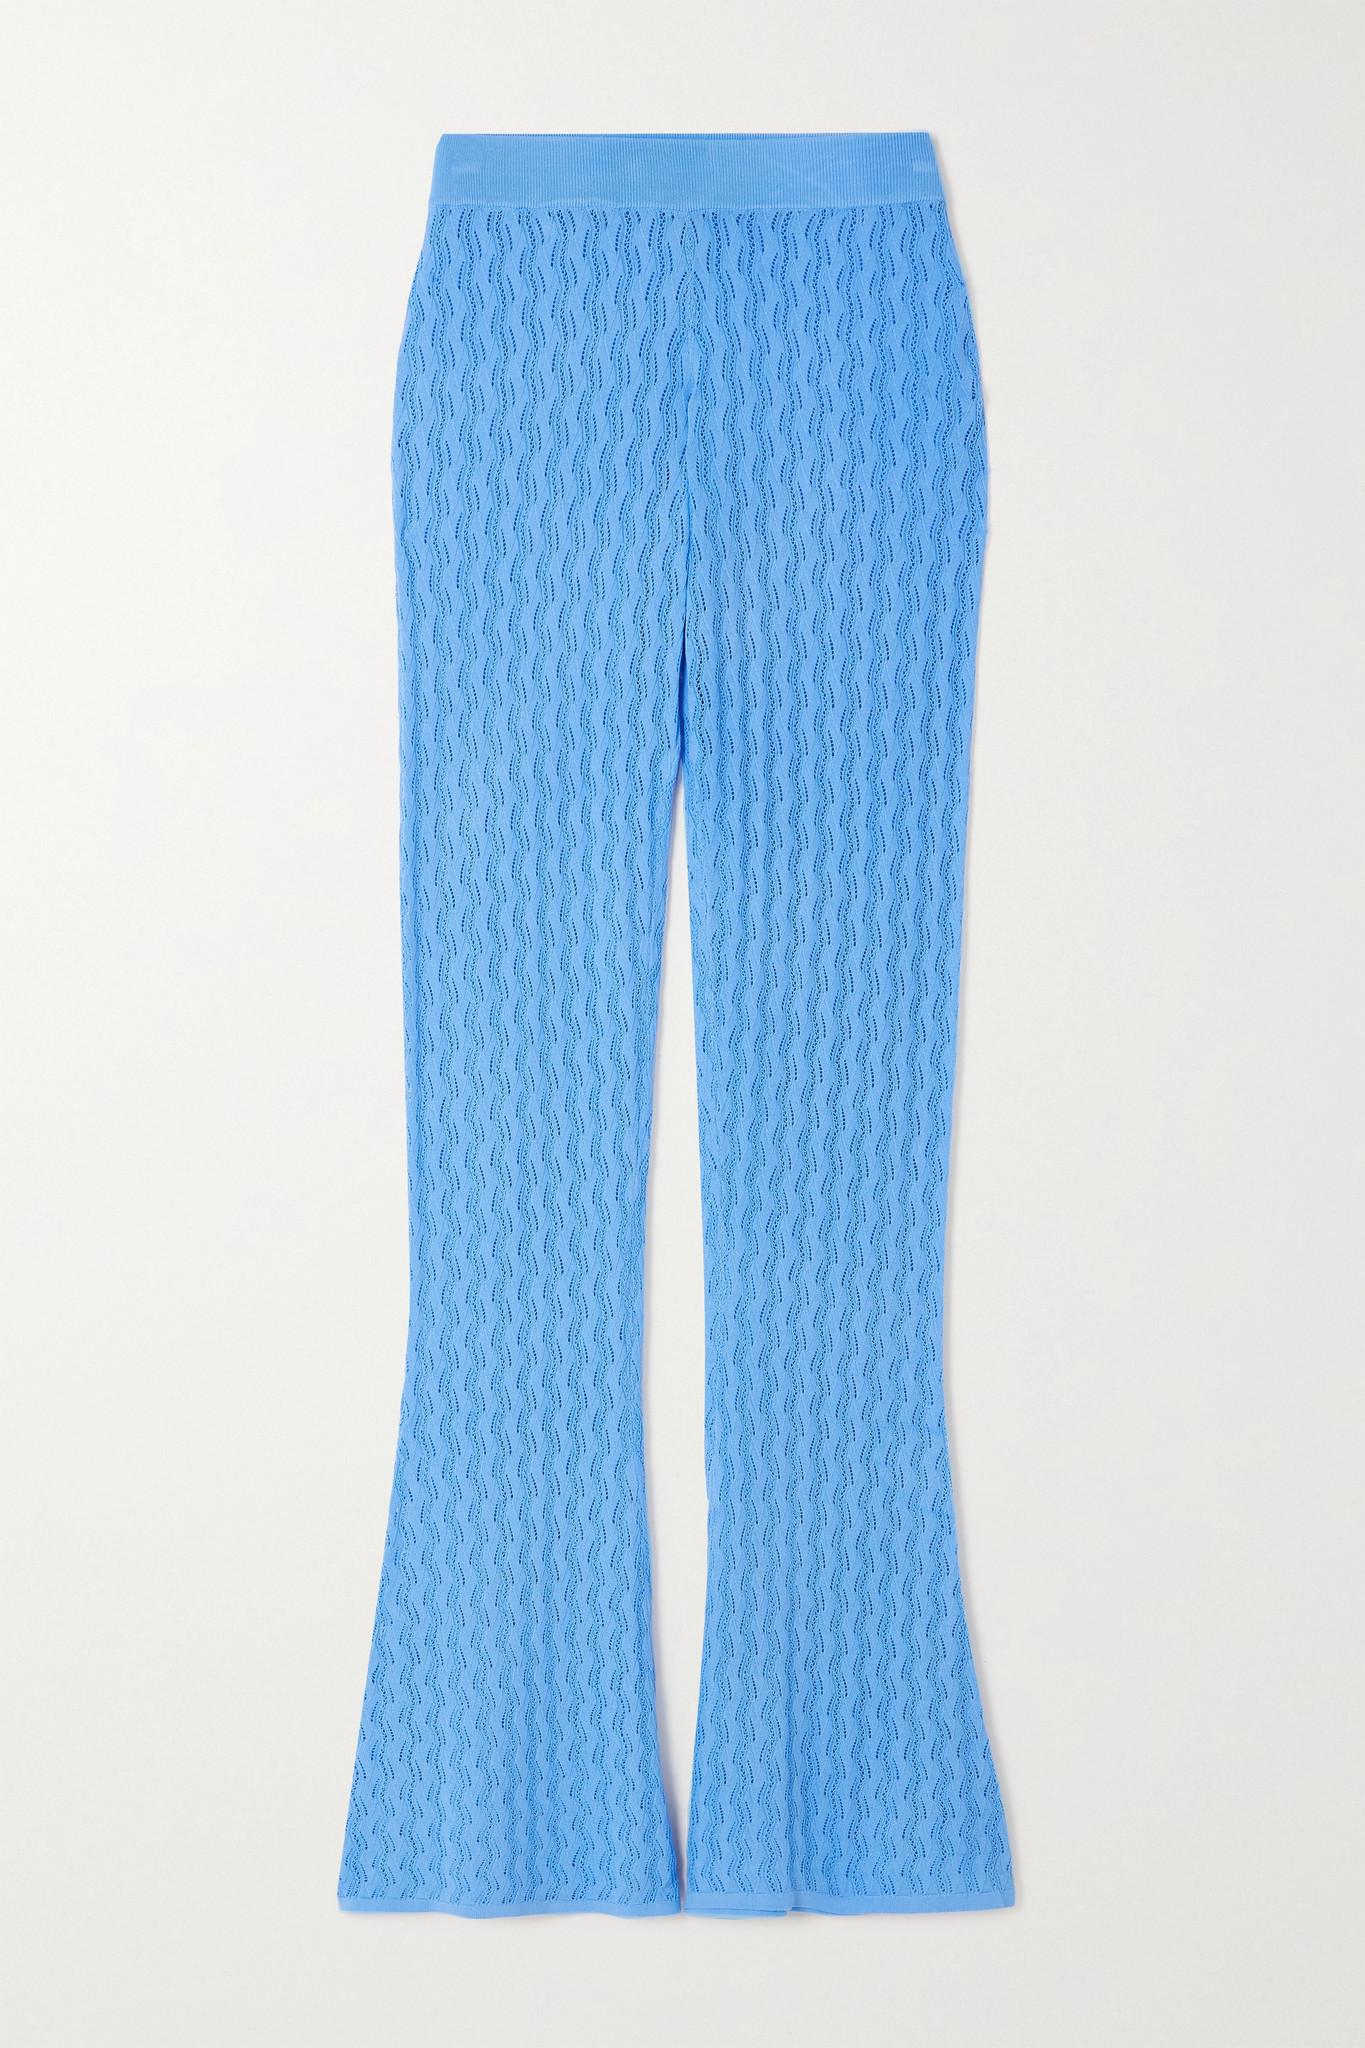 DODO BAR OR - Sophia 挑窿针织喇叭裤 - 蓝色 - IT40